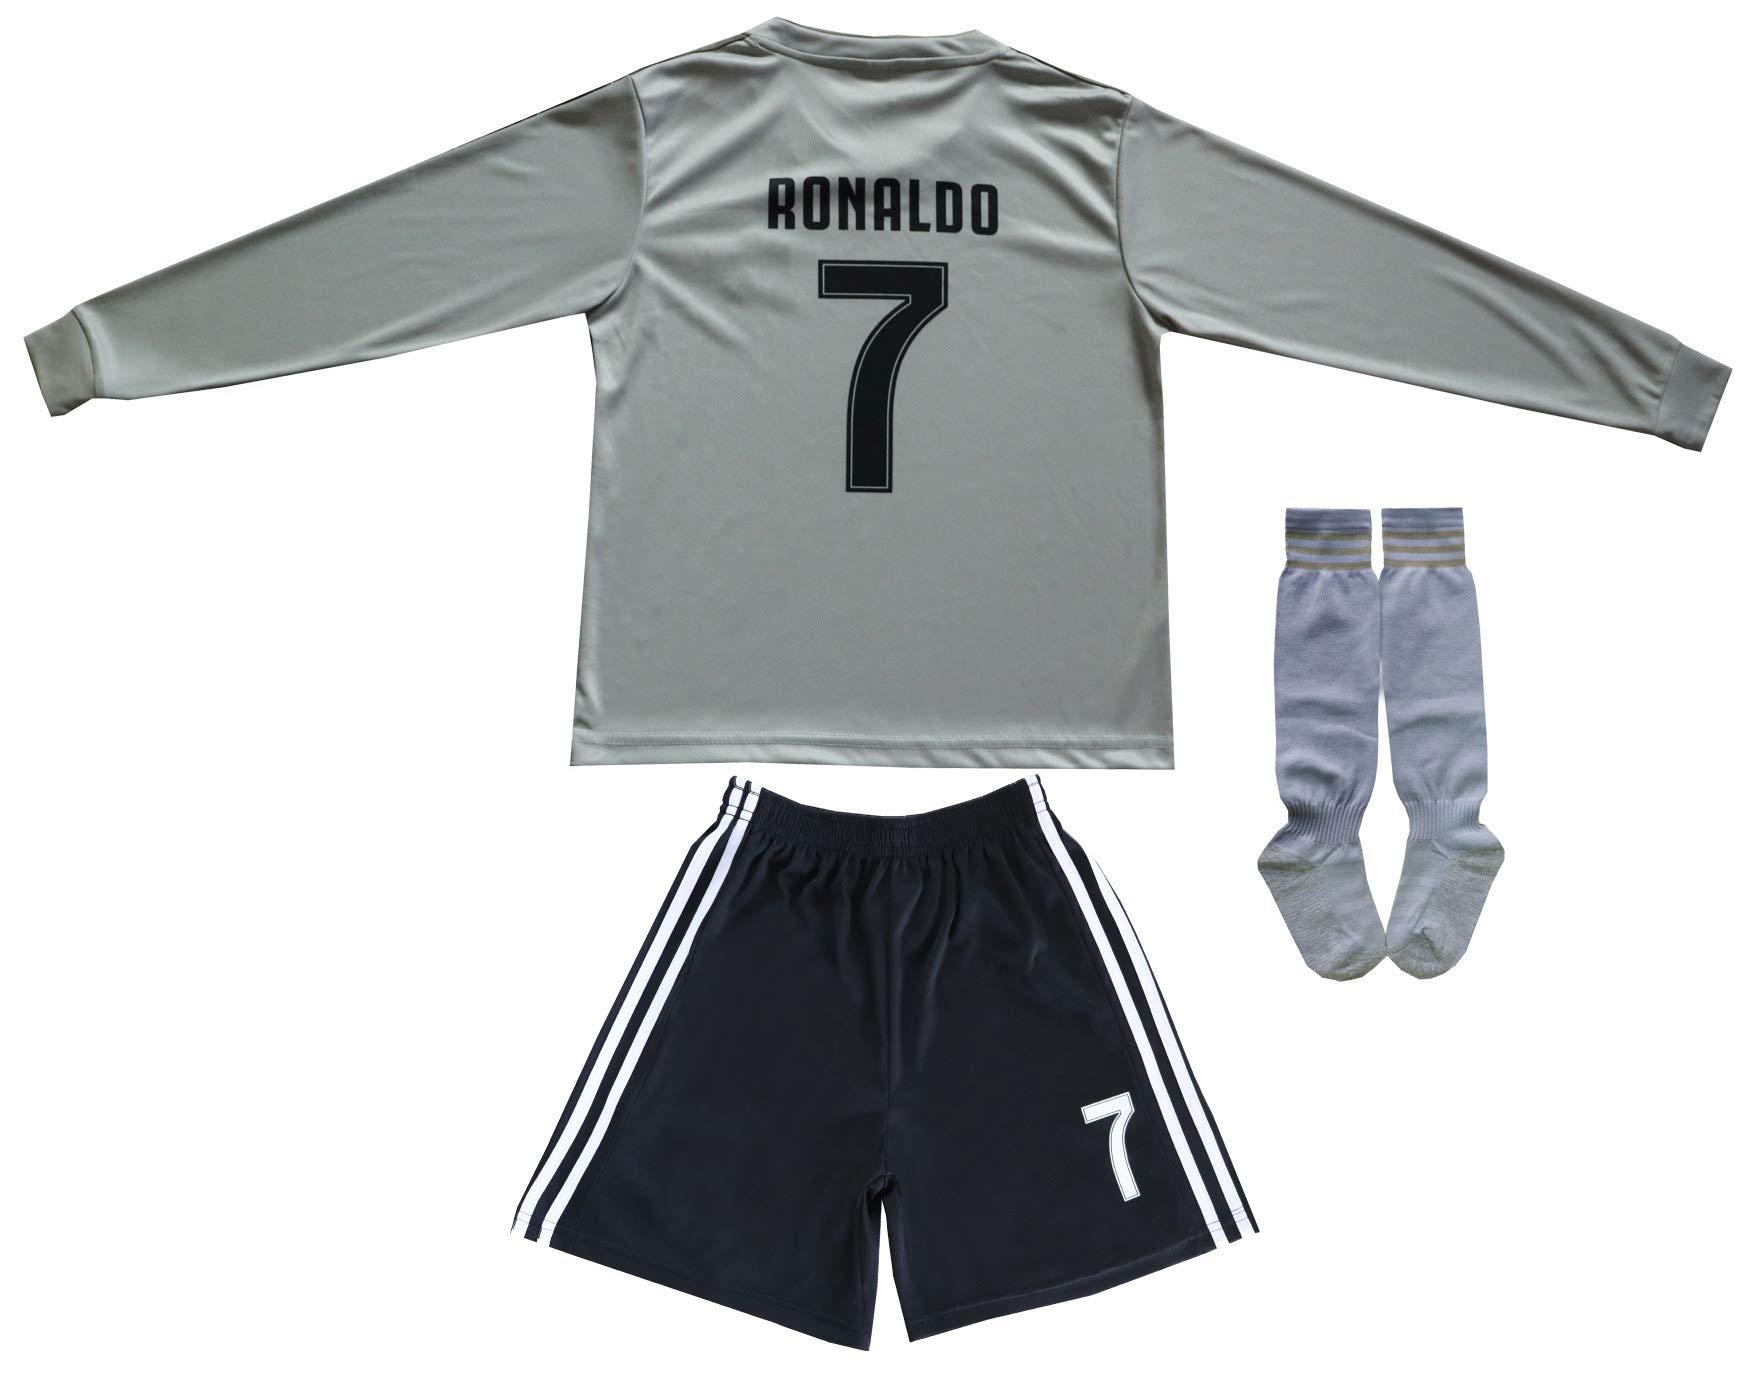 GamesDur 2018/2019 Cristiano Ronaldo #7 Away Long Sleeve Juventus Soccer Kids Jersey & Shorts Socks Set Youth Sizes (Juve), 6-7 Years